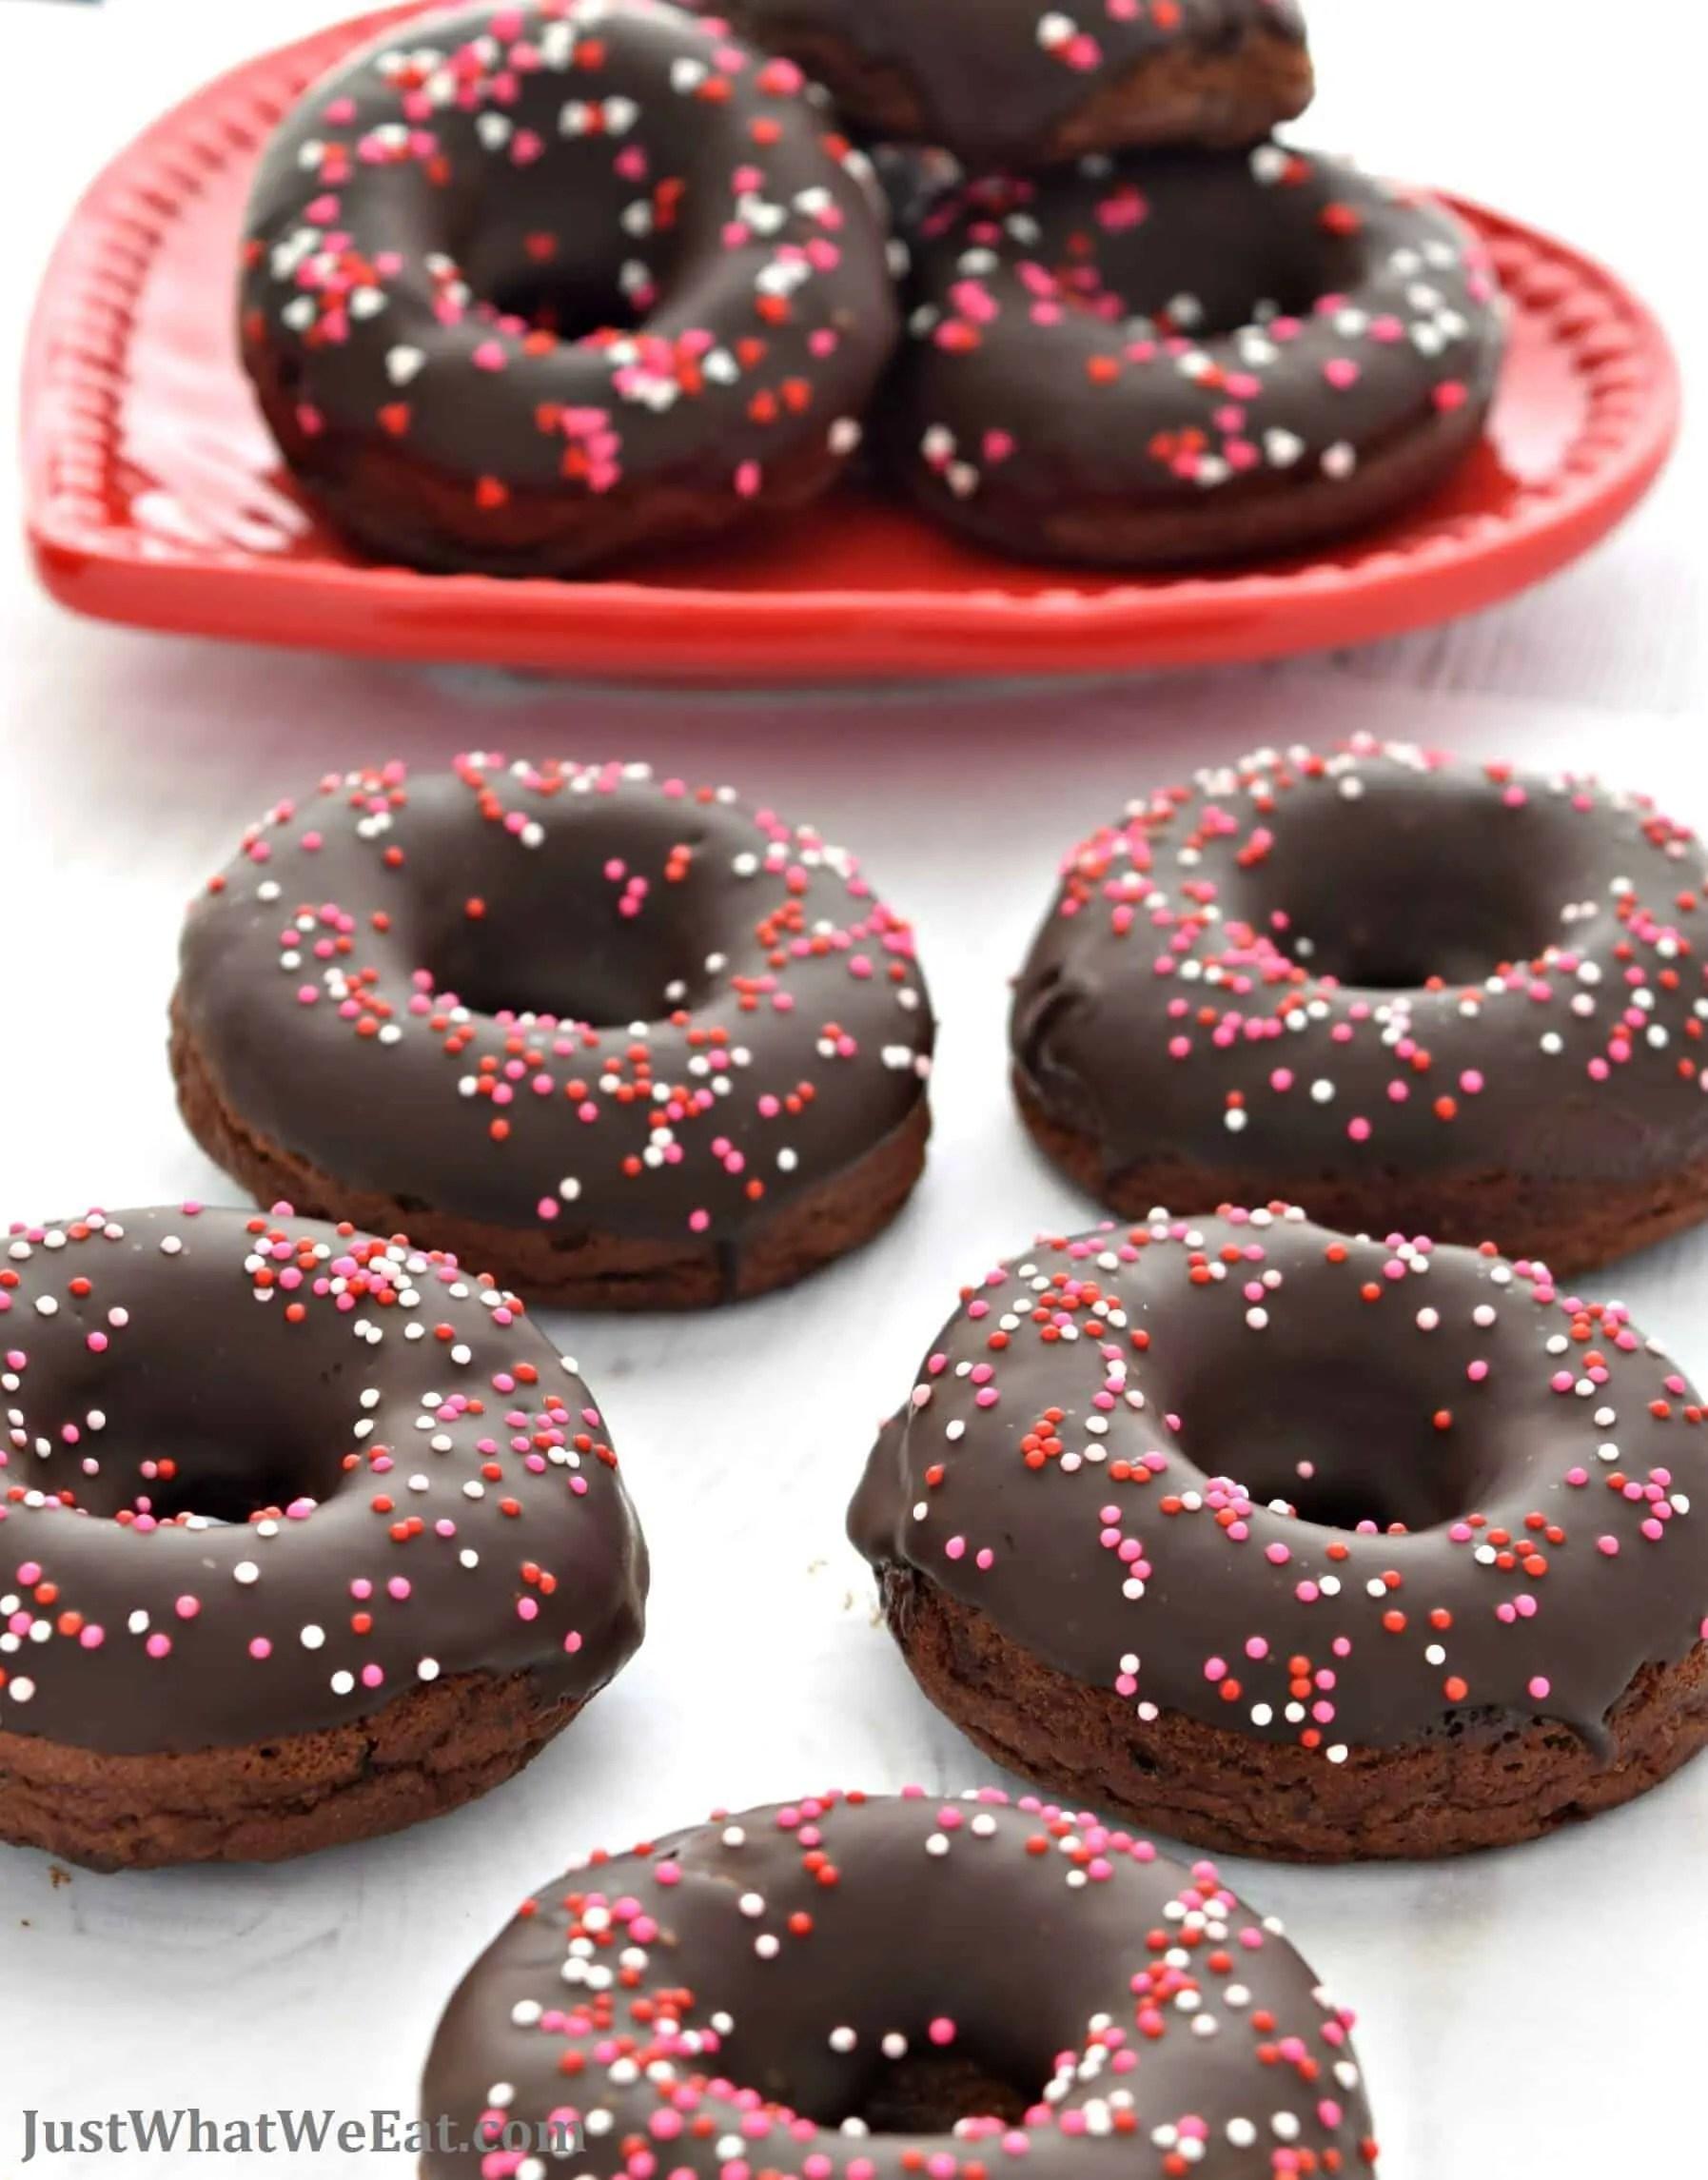 Baked Chocolate Cake Donuts - Gluten Free, Vegan, Refined Sugar Free